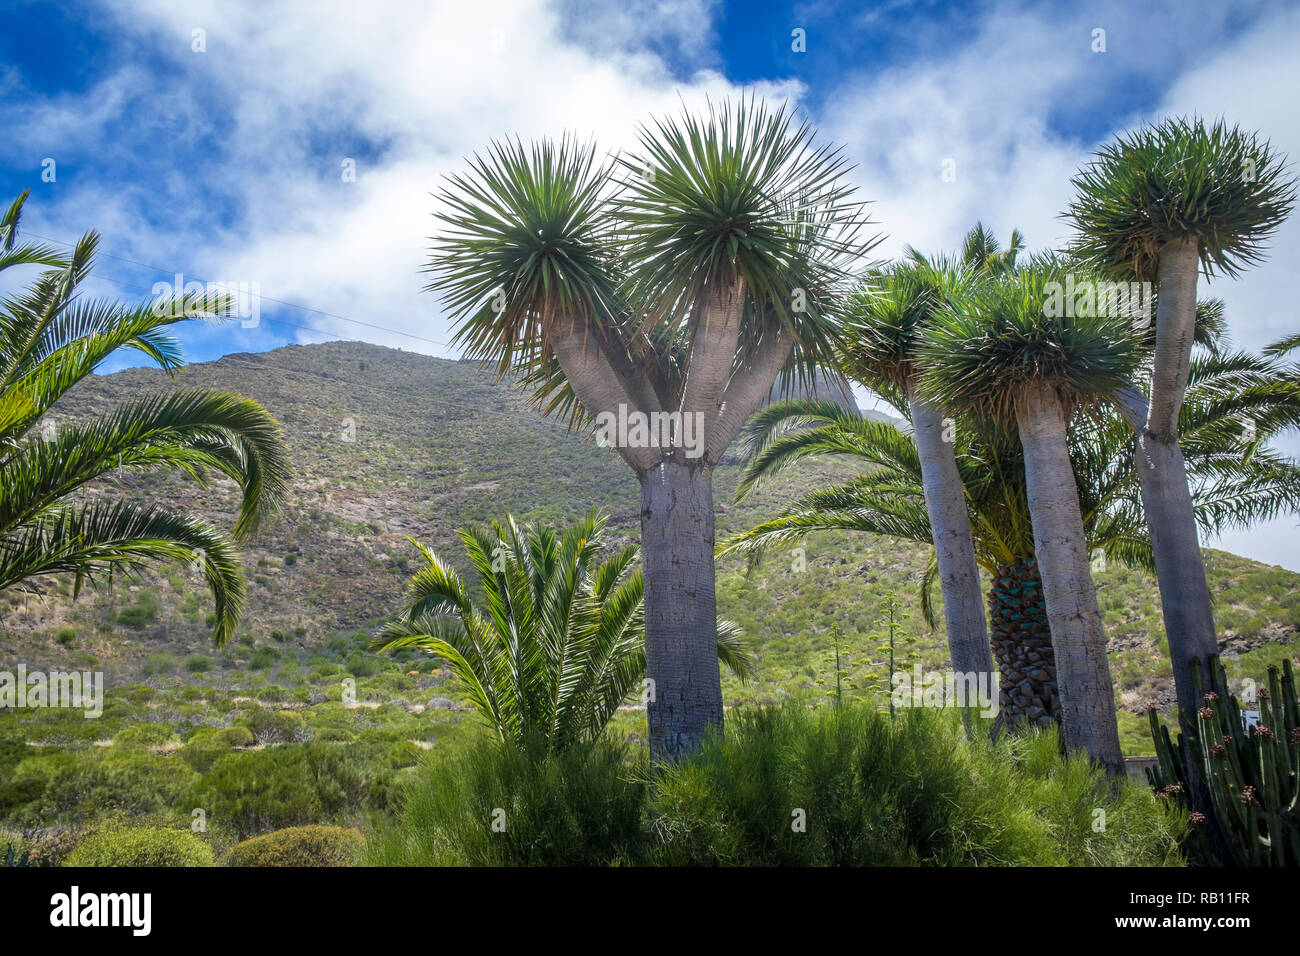 Drachenbaum in Santiage del Teide auf Teneriffa, Spanien Stockbild